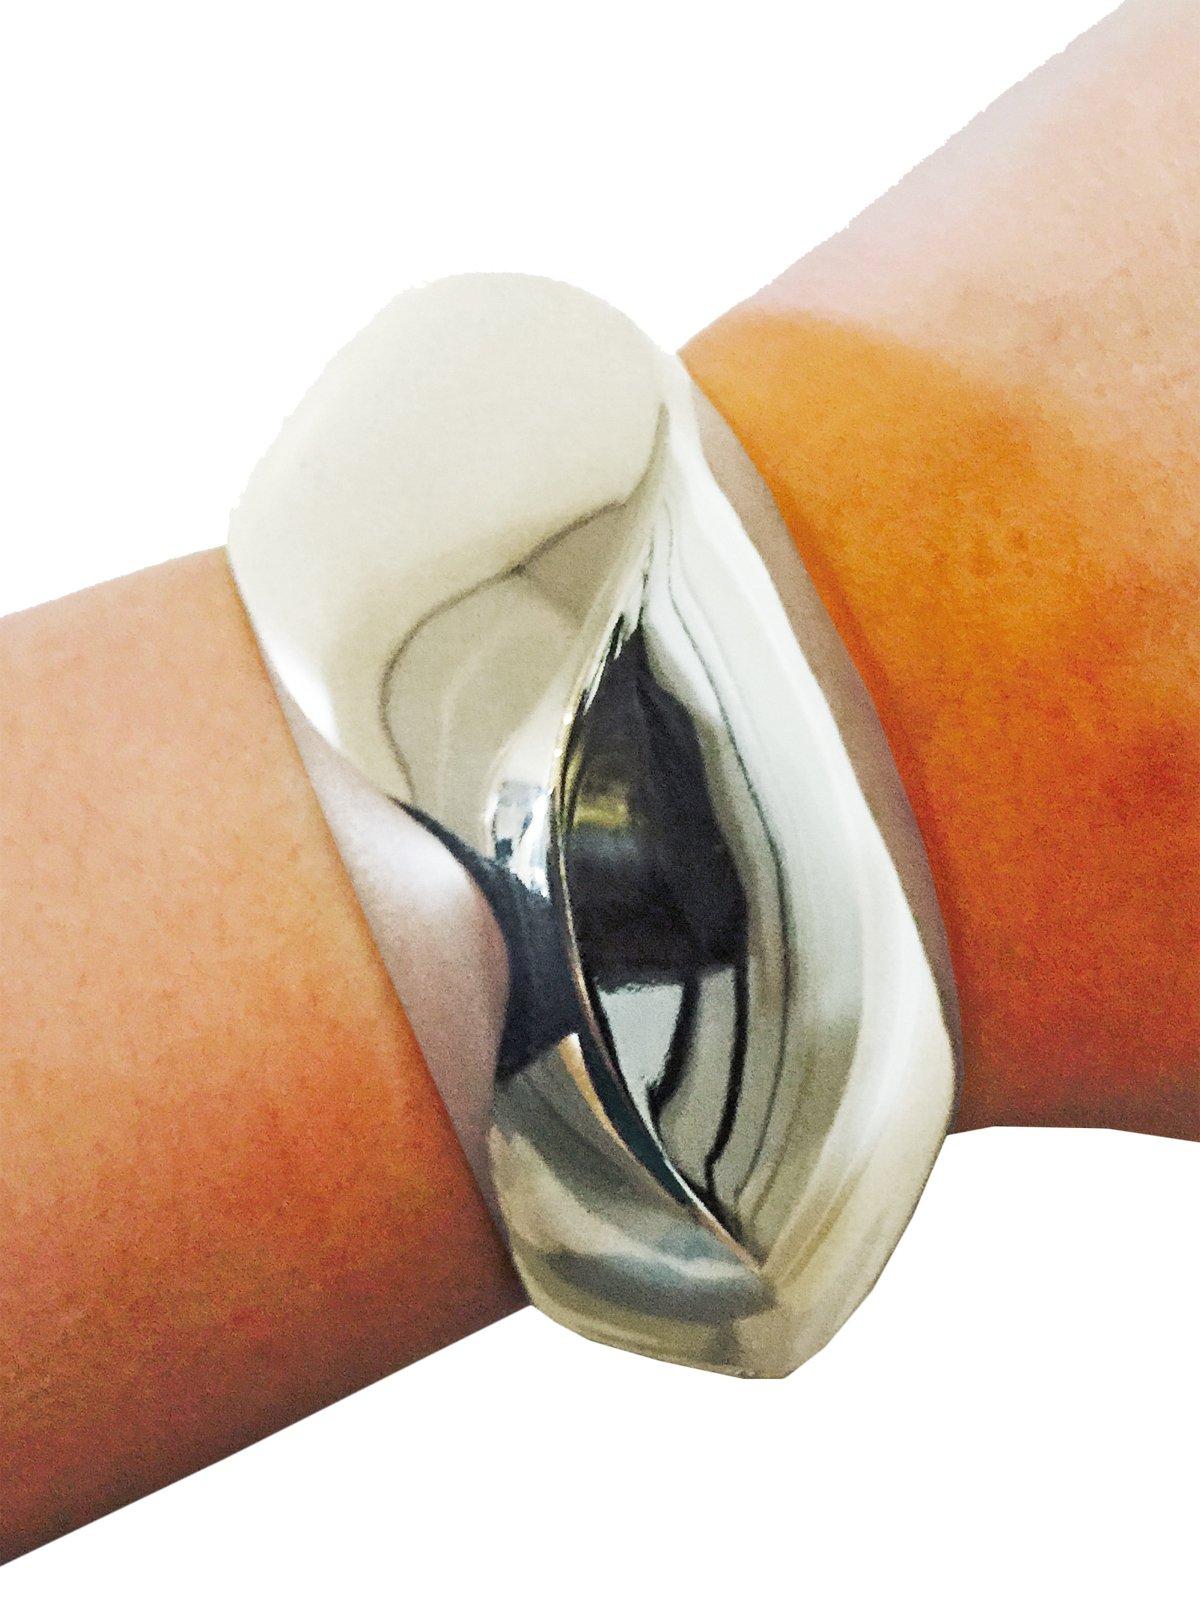 Fitbit Bracelet for FitBit Flex Fitness Trackers - The SASHA Wavy Metal Hinge Bangle Fitbit Bracelet (Silver, Fitbit Flex)